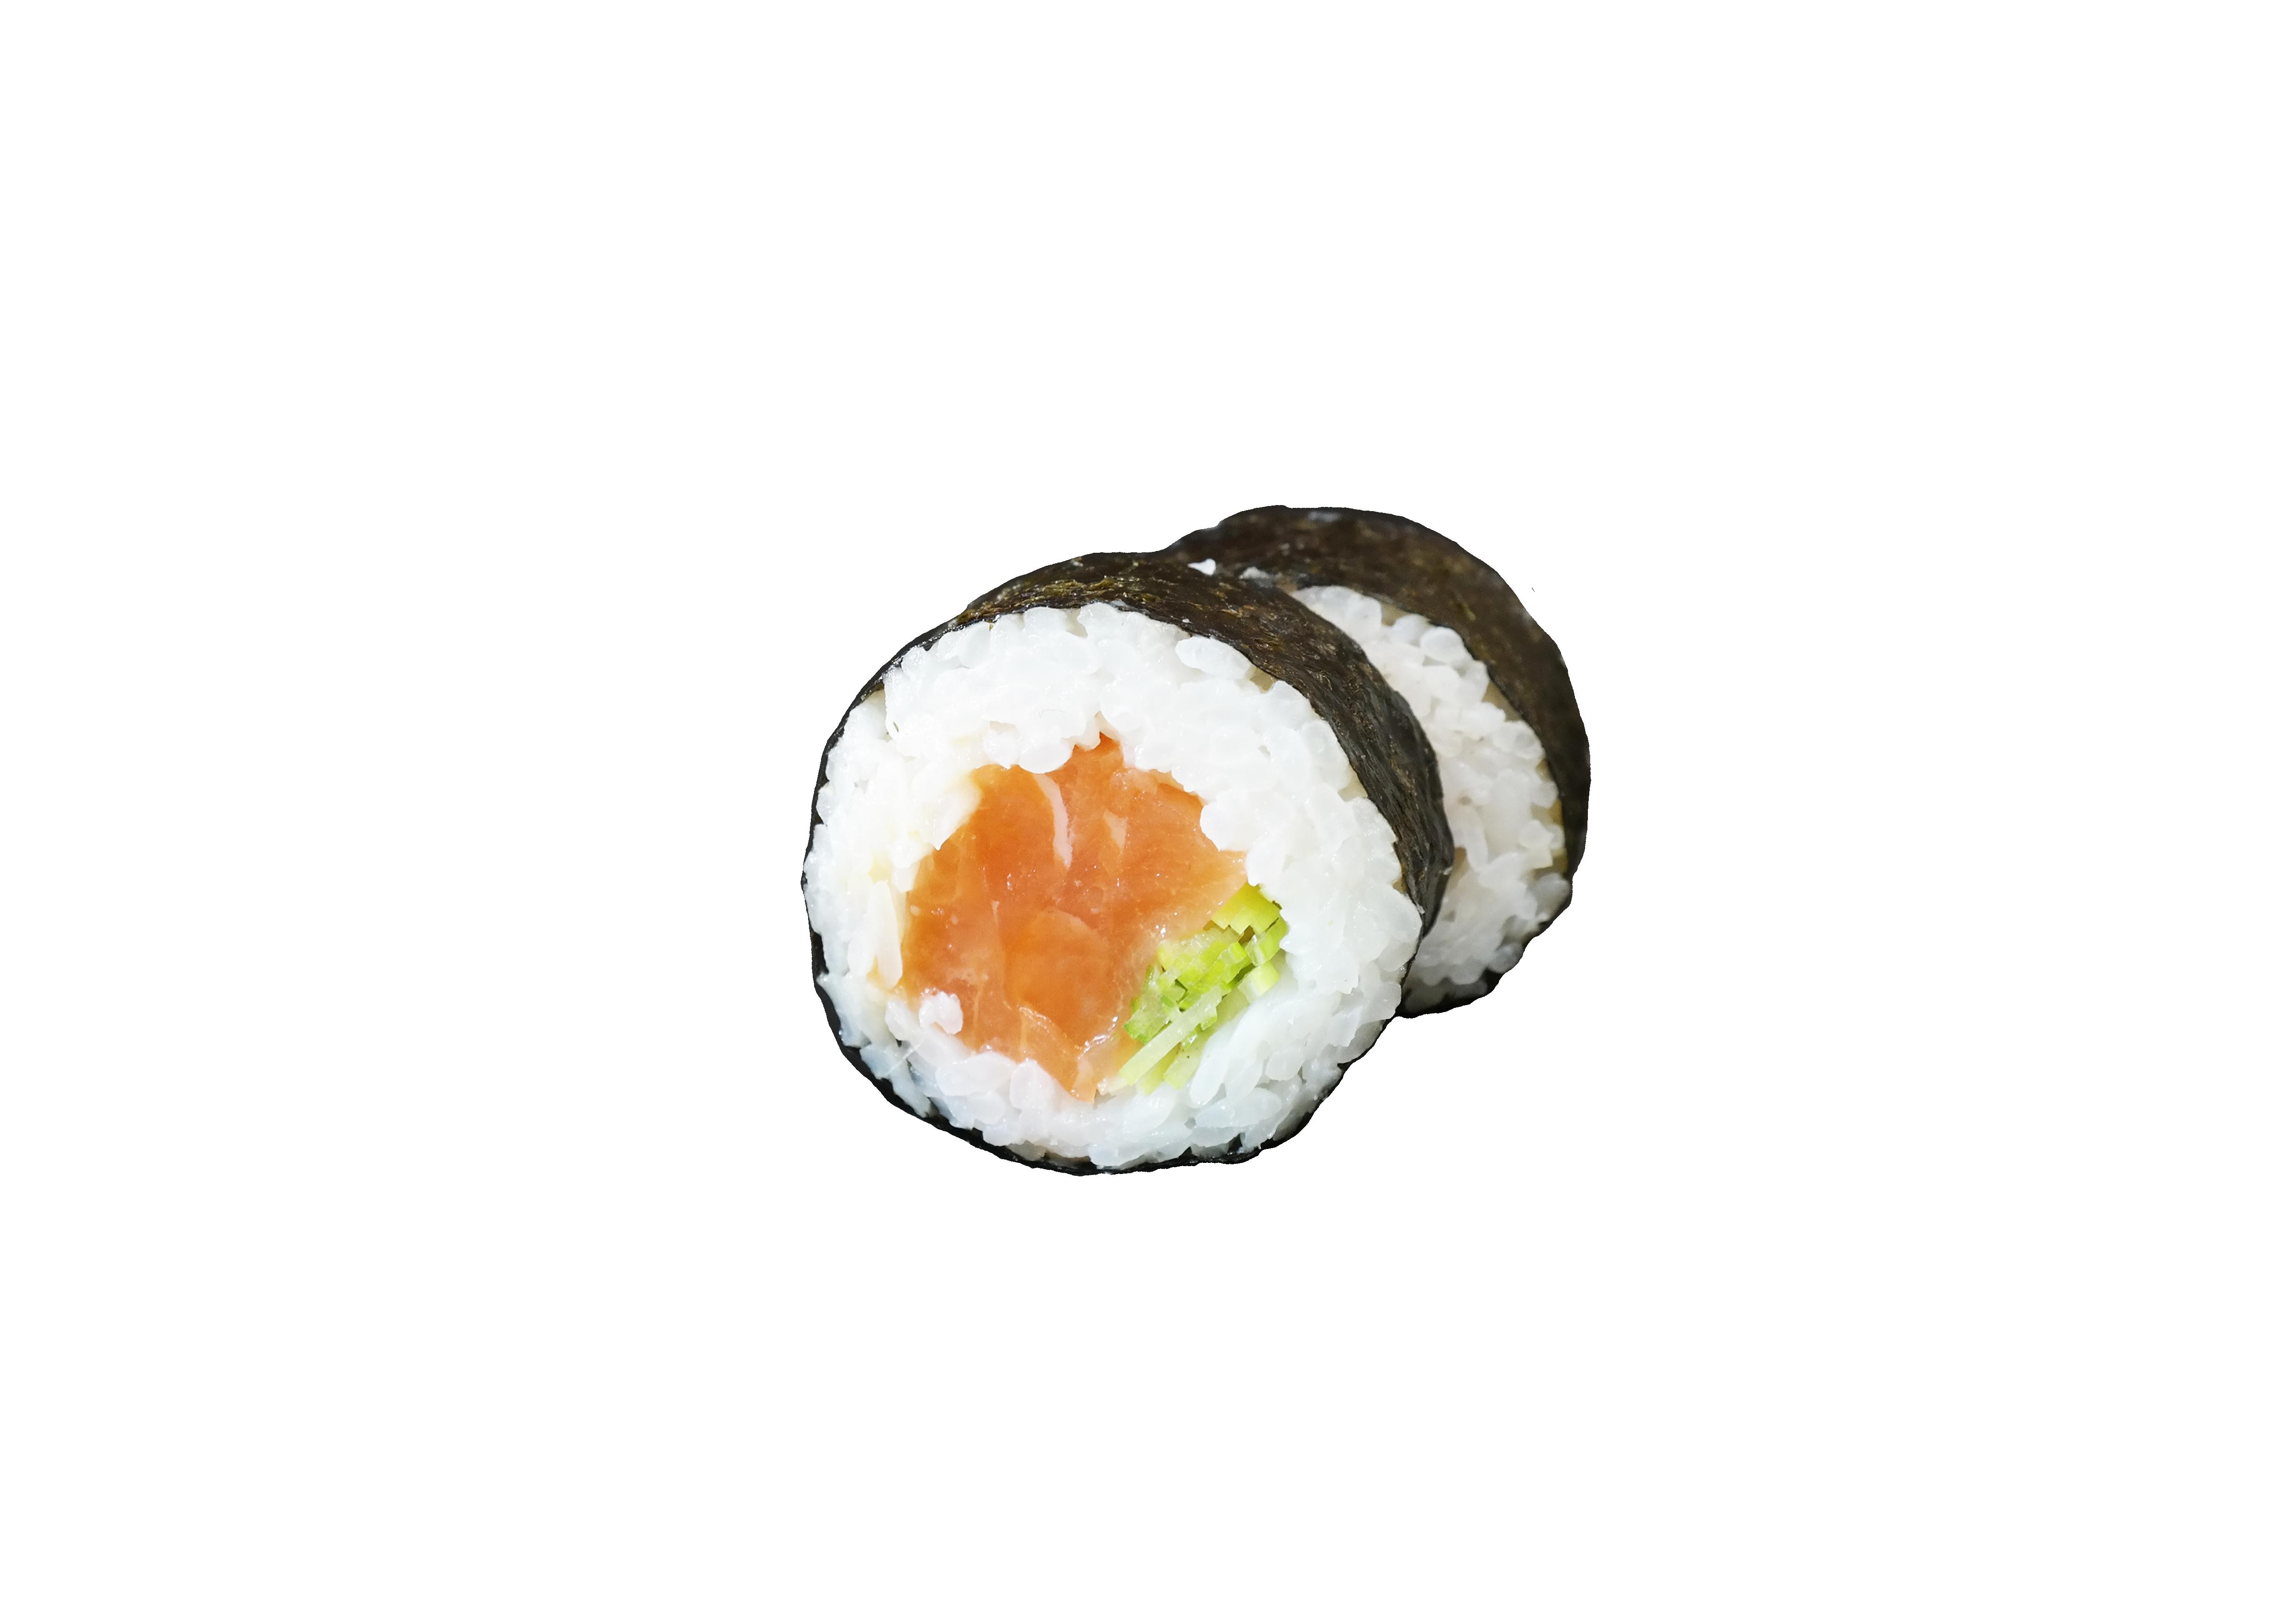 Salmon clipart salmon sushi. Spicy mayo chumaki yamatocatering